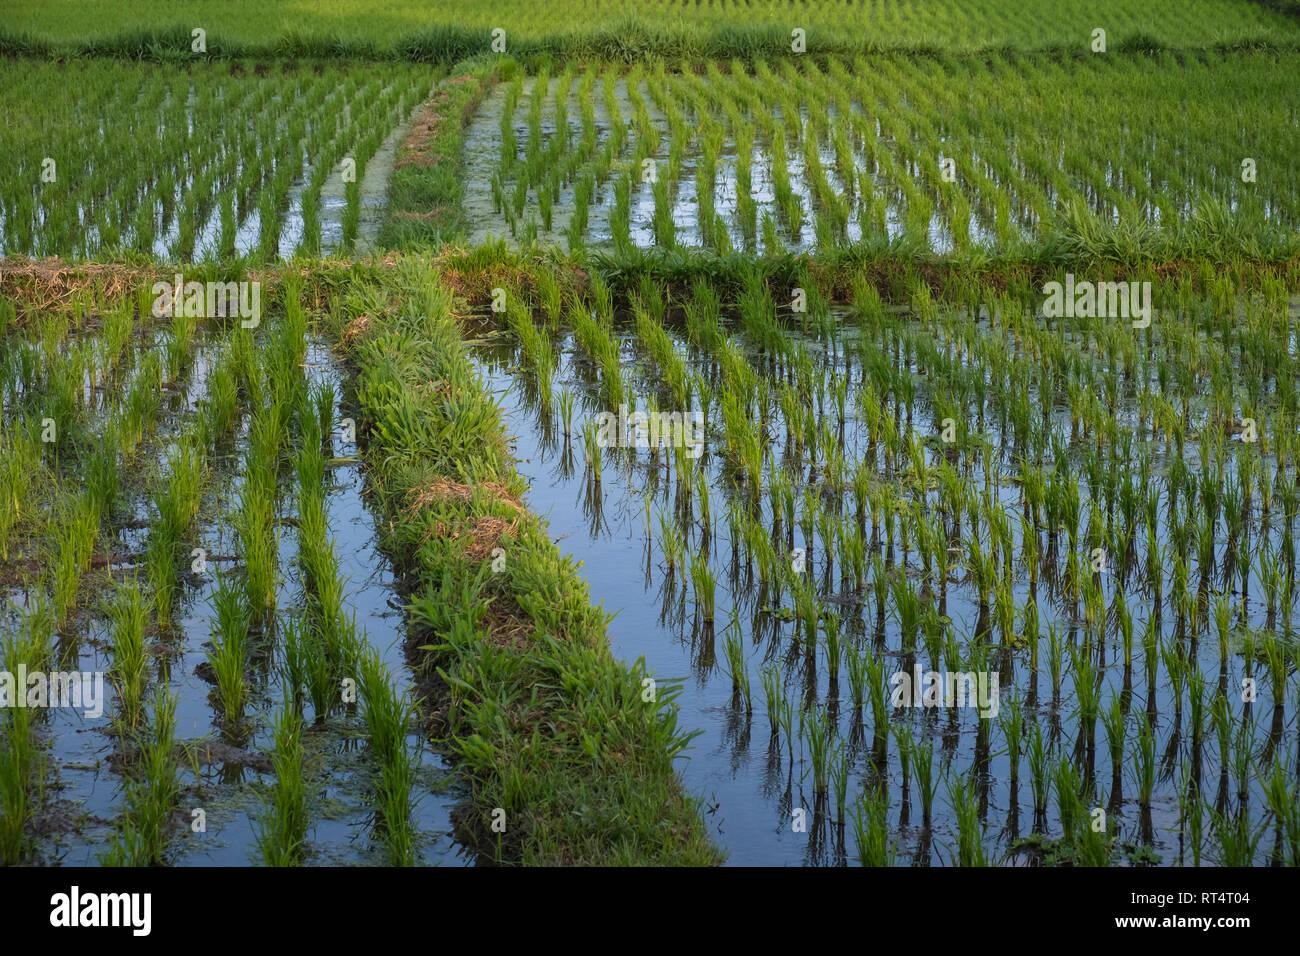 Rice fields in Bali, Indonesia Stock Photo